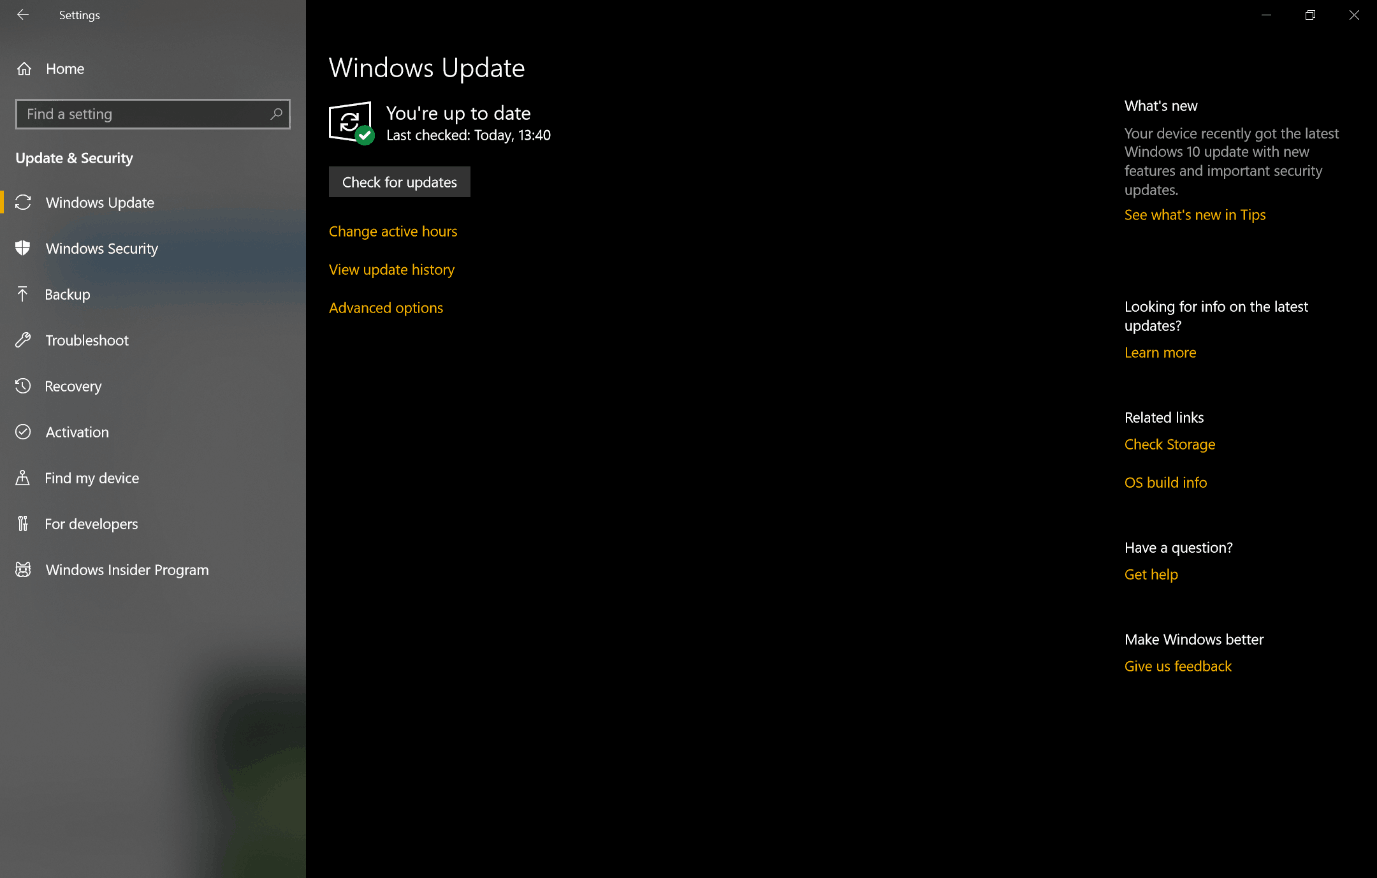 Windows 10 Oct.2018 Update